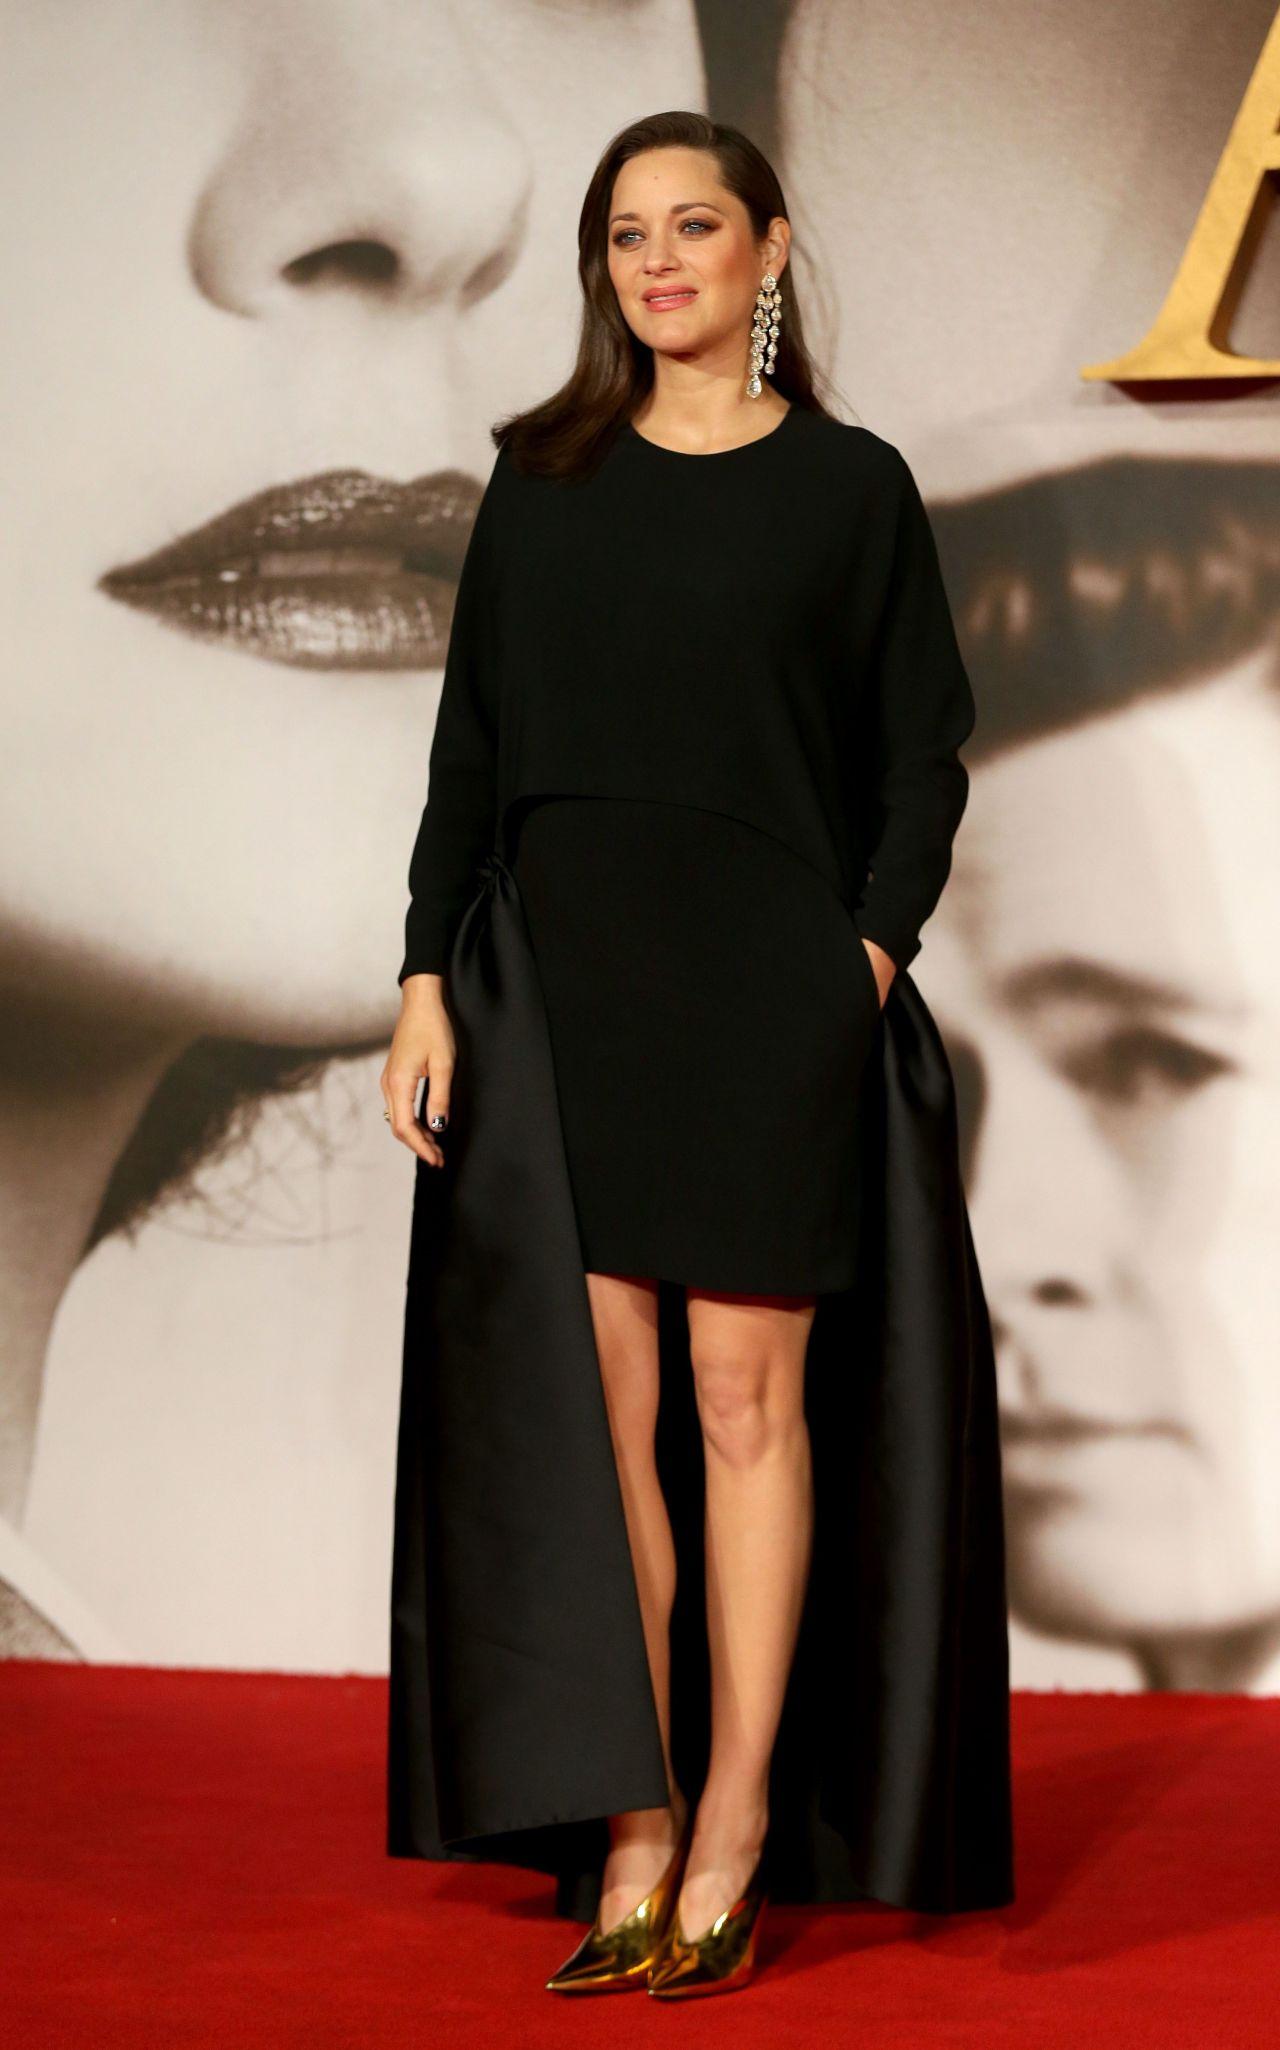 Marion Cotillard Allied Film Premiere In London 11 21